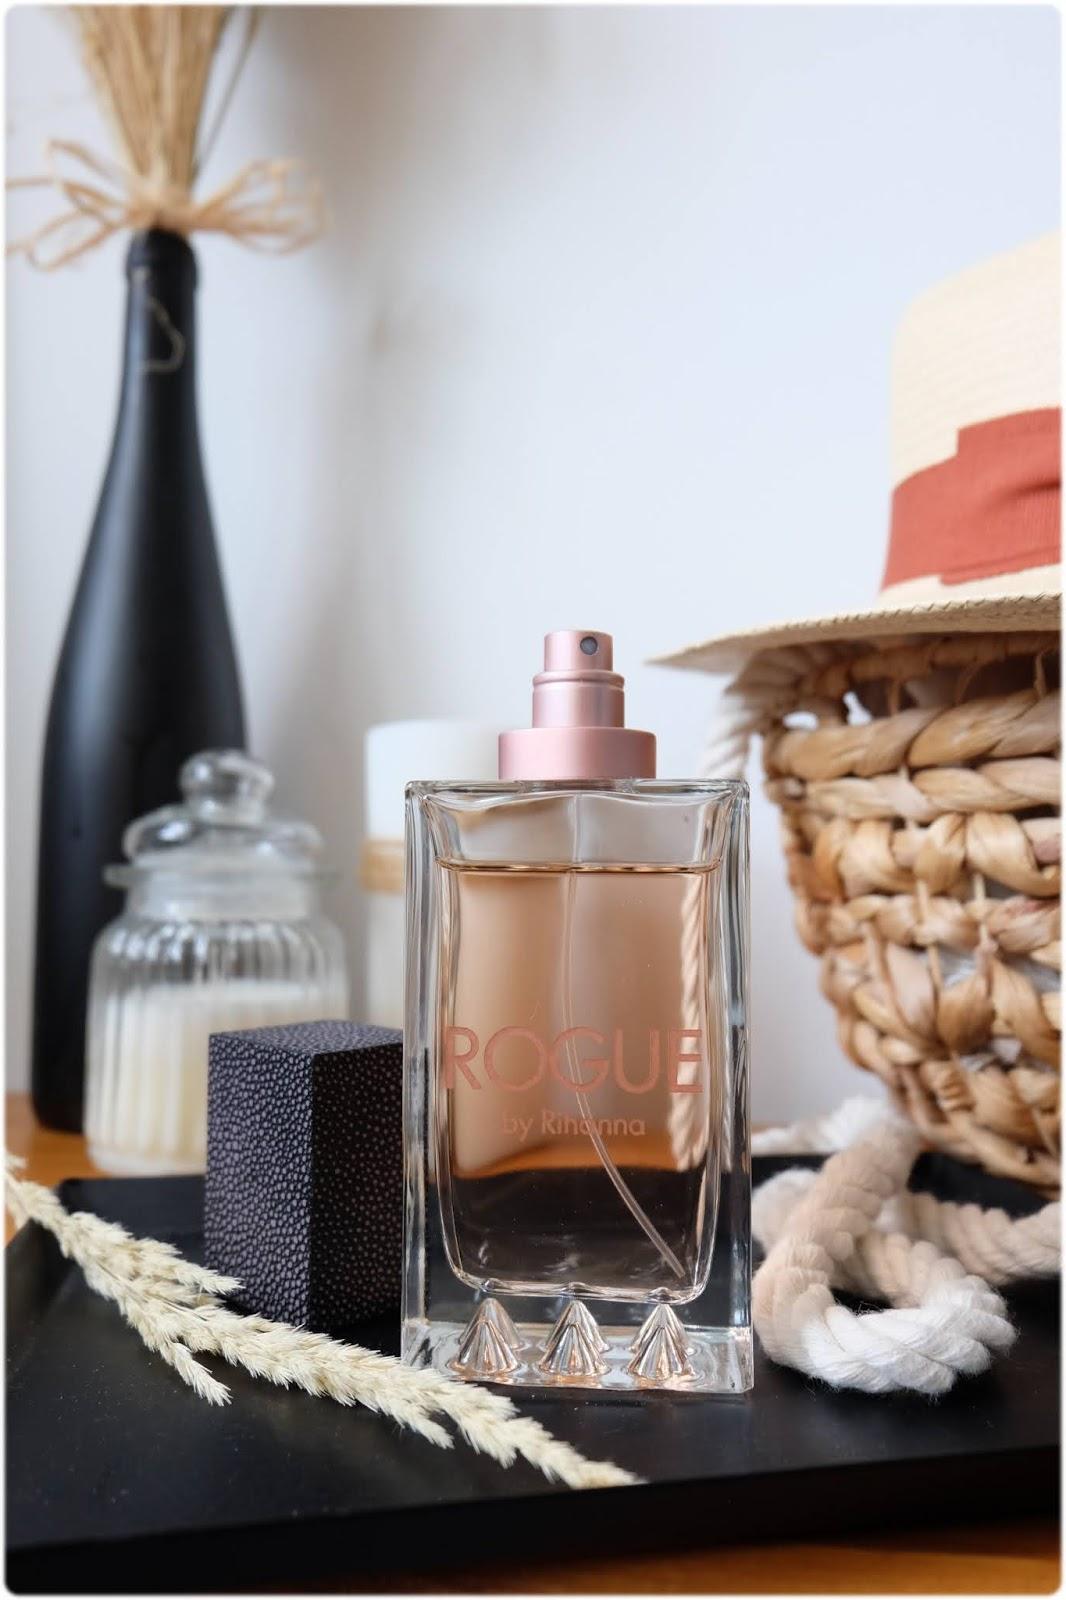 eau de parfum Rogue by Rihanna